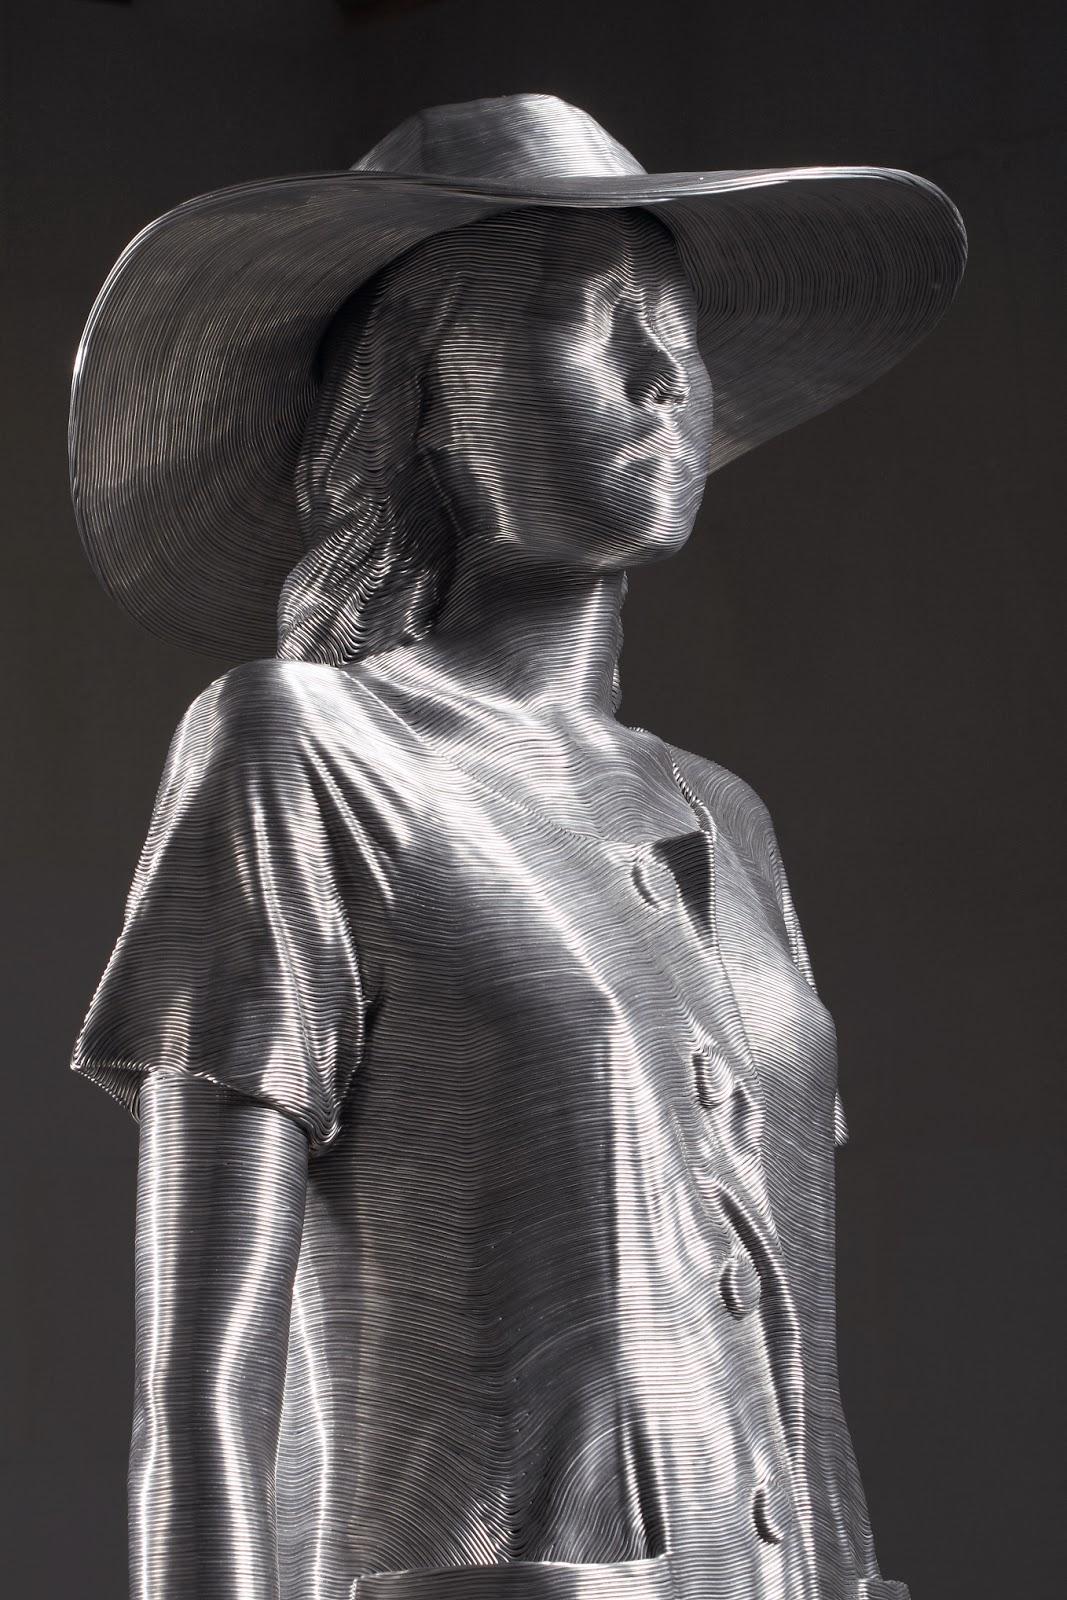 08-Park-Seung-Mo-South-Korean-Artist-&-Sculptor-Wire-Sculpture-www-designstack-co